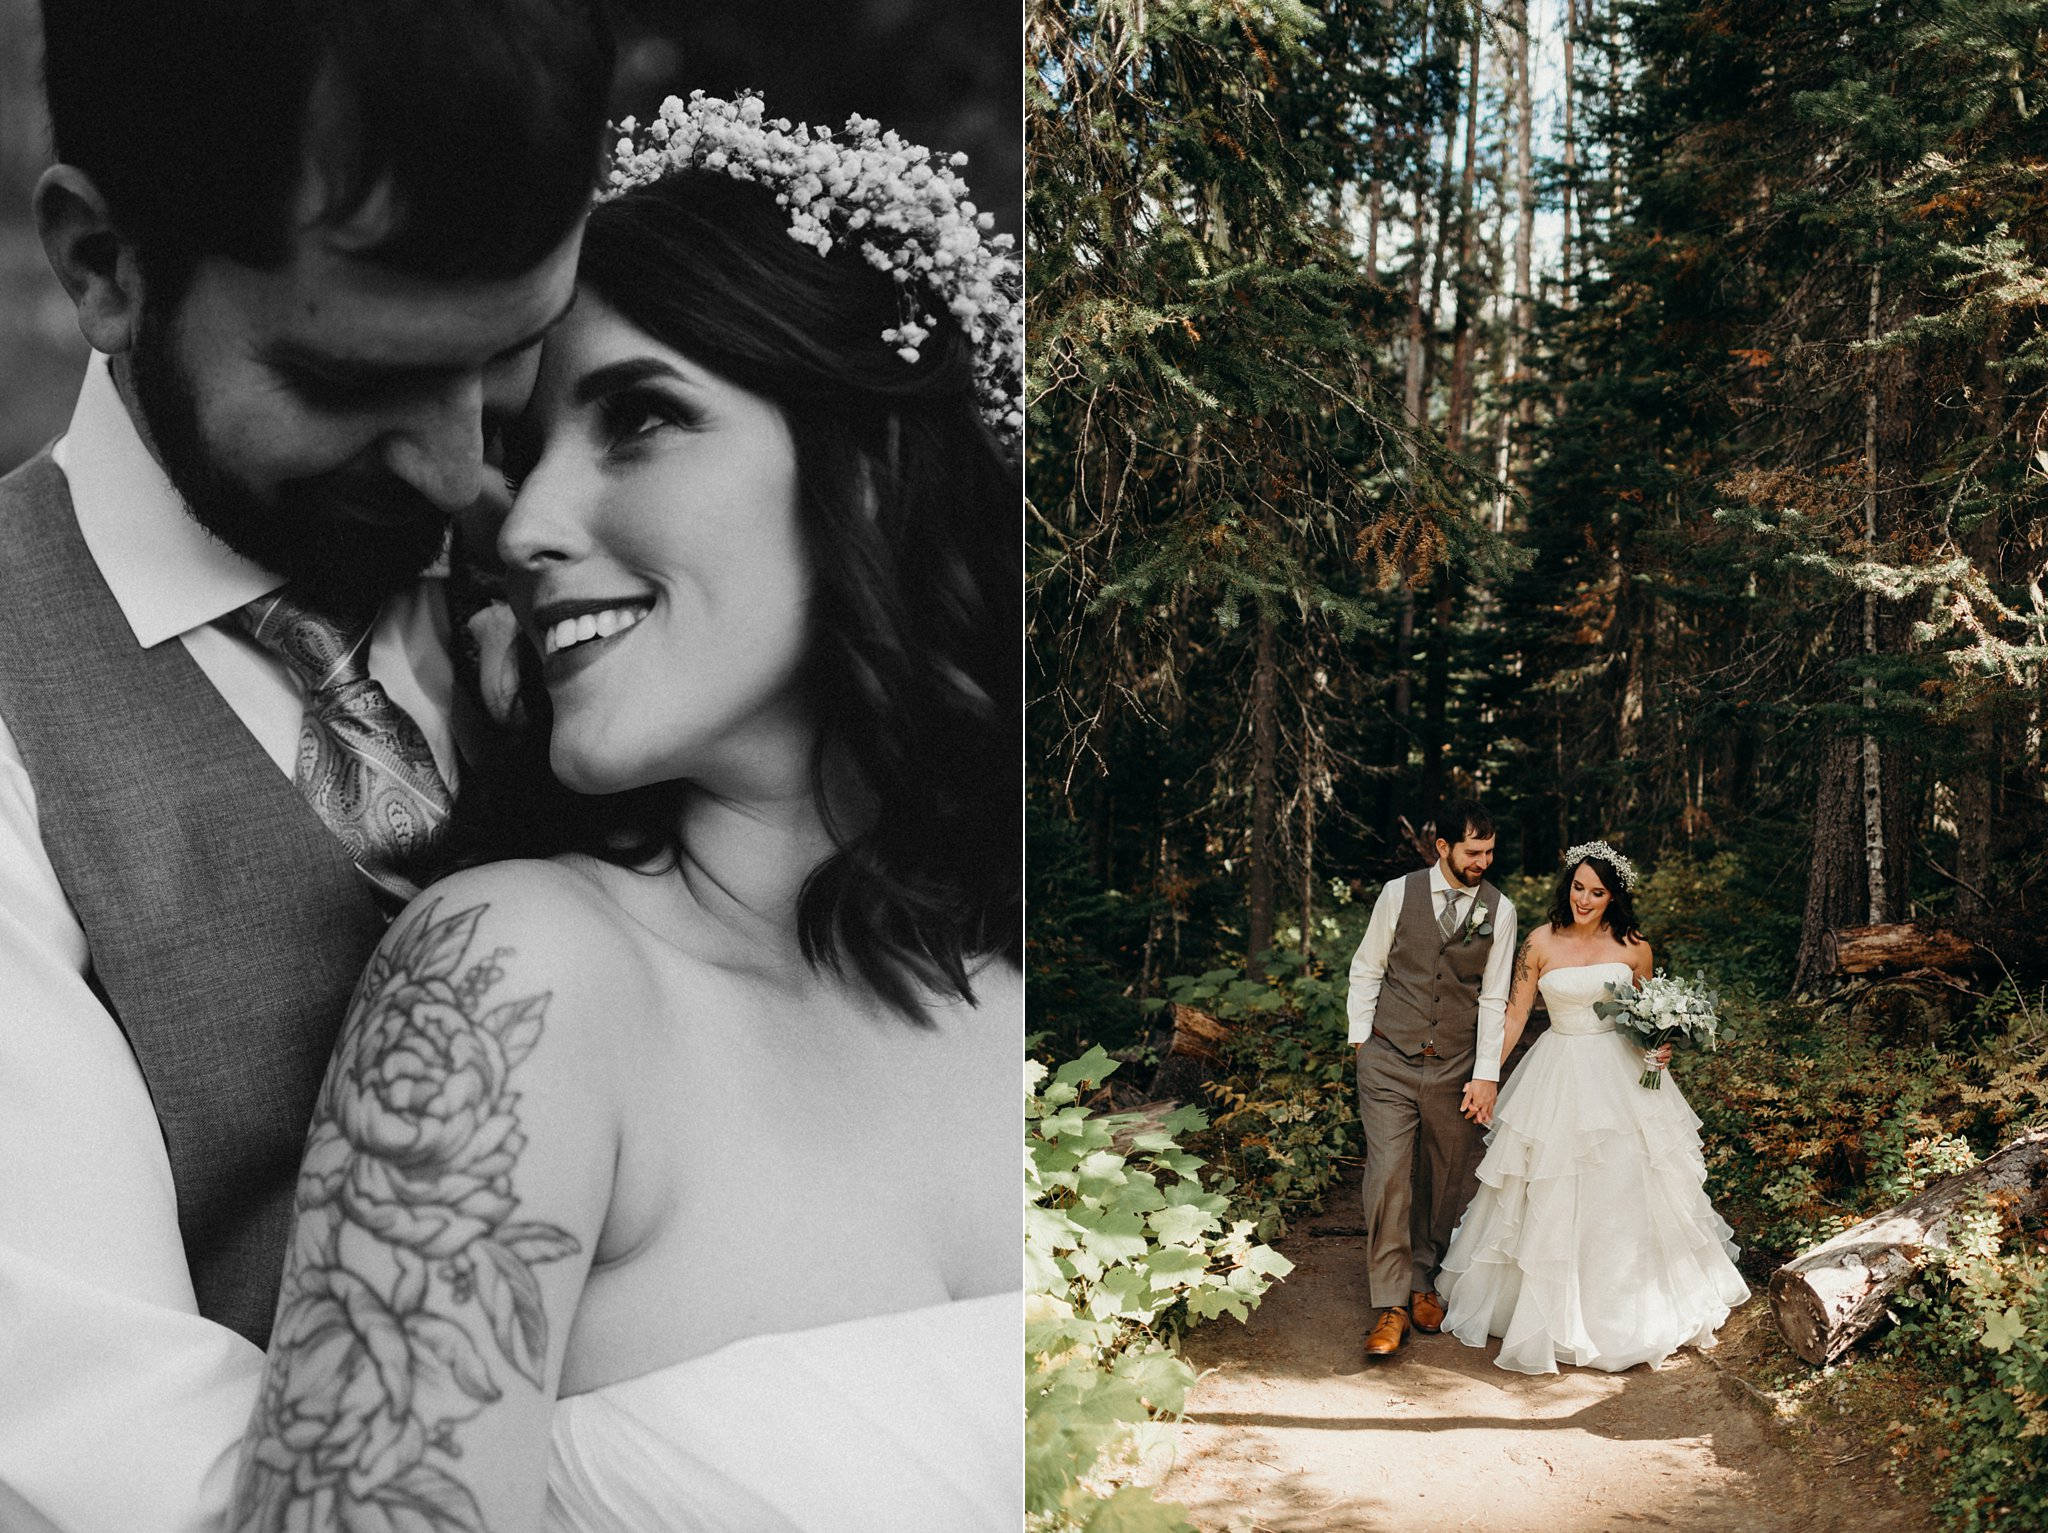 kaihla_tonai_intimate_wedding_elopement_photographer_6885.jpg